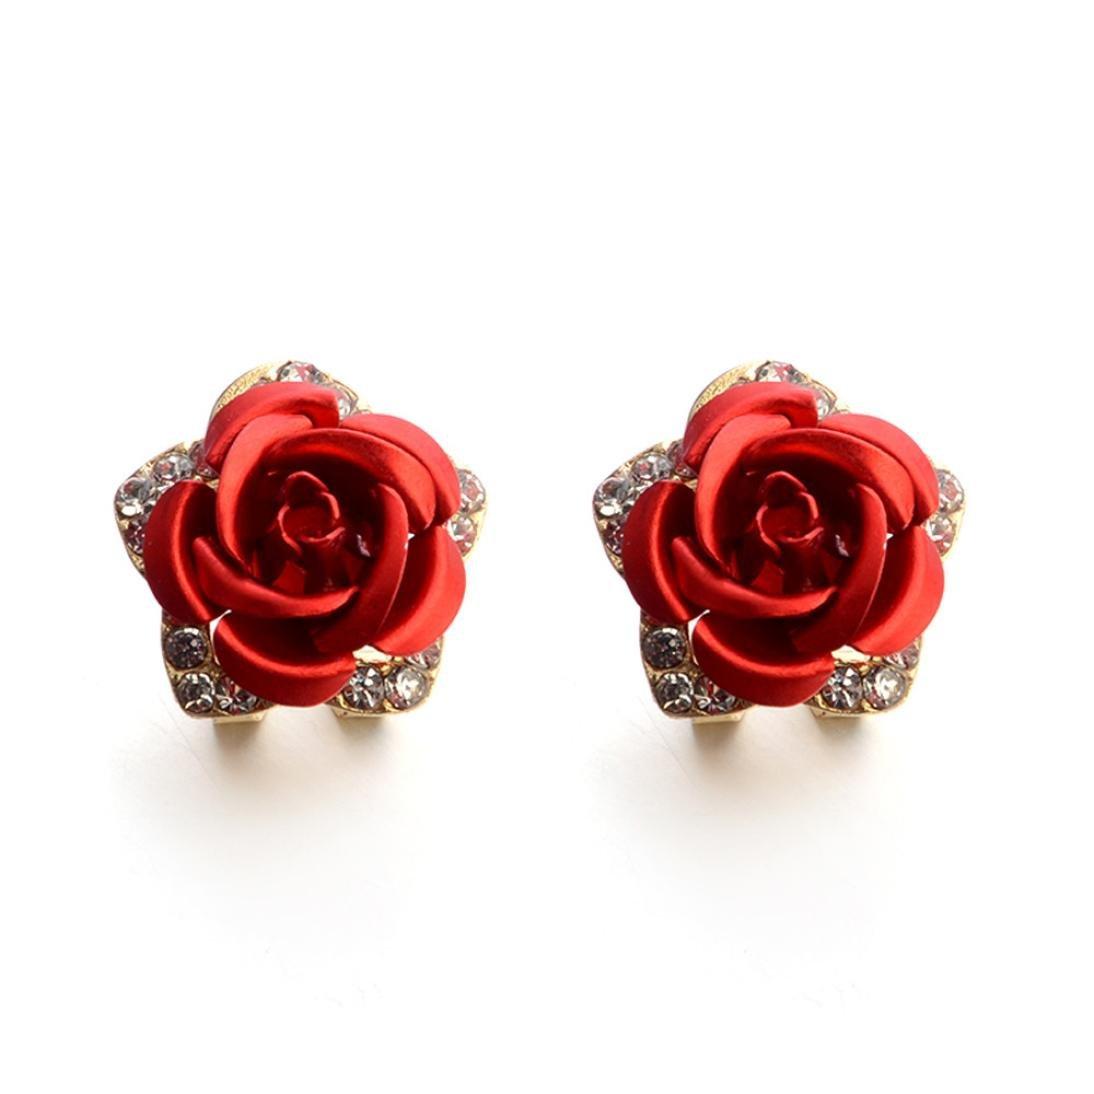 Fashion Jewelry Toimoth Sweet Rose Rhinestone Earrings Summer Style (Red)